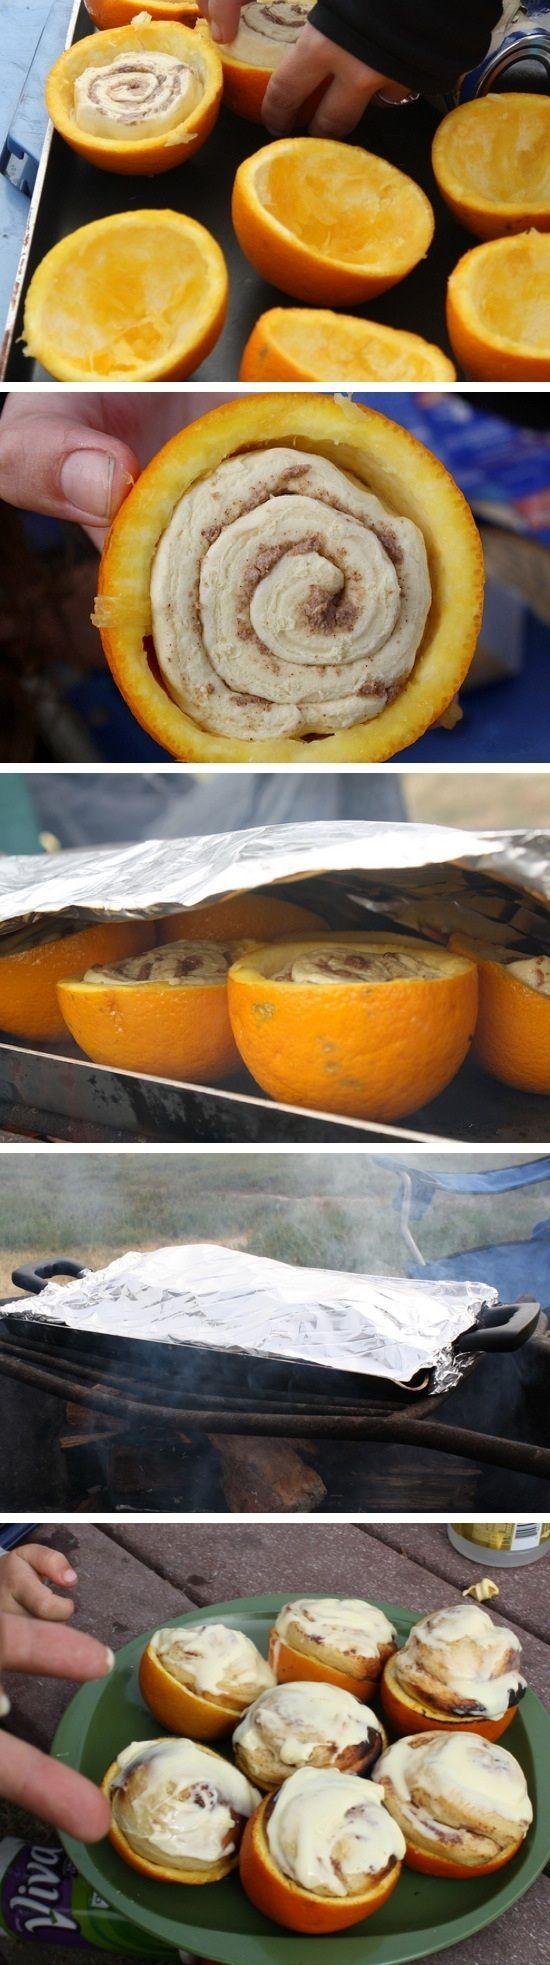 Campfire Cinnamon Rolls - a neat idea for family camping. Stick a cinnamon roll inside of an orange peel!